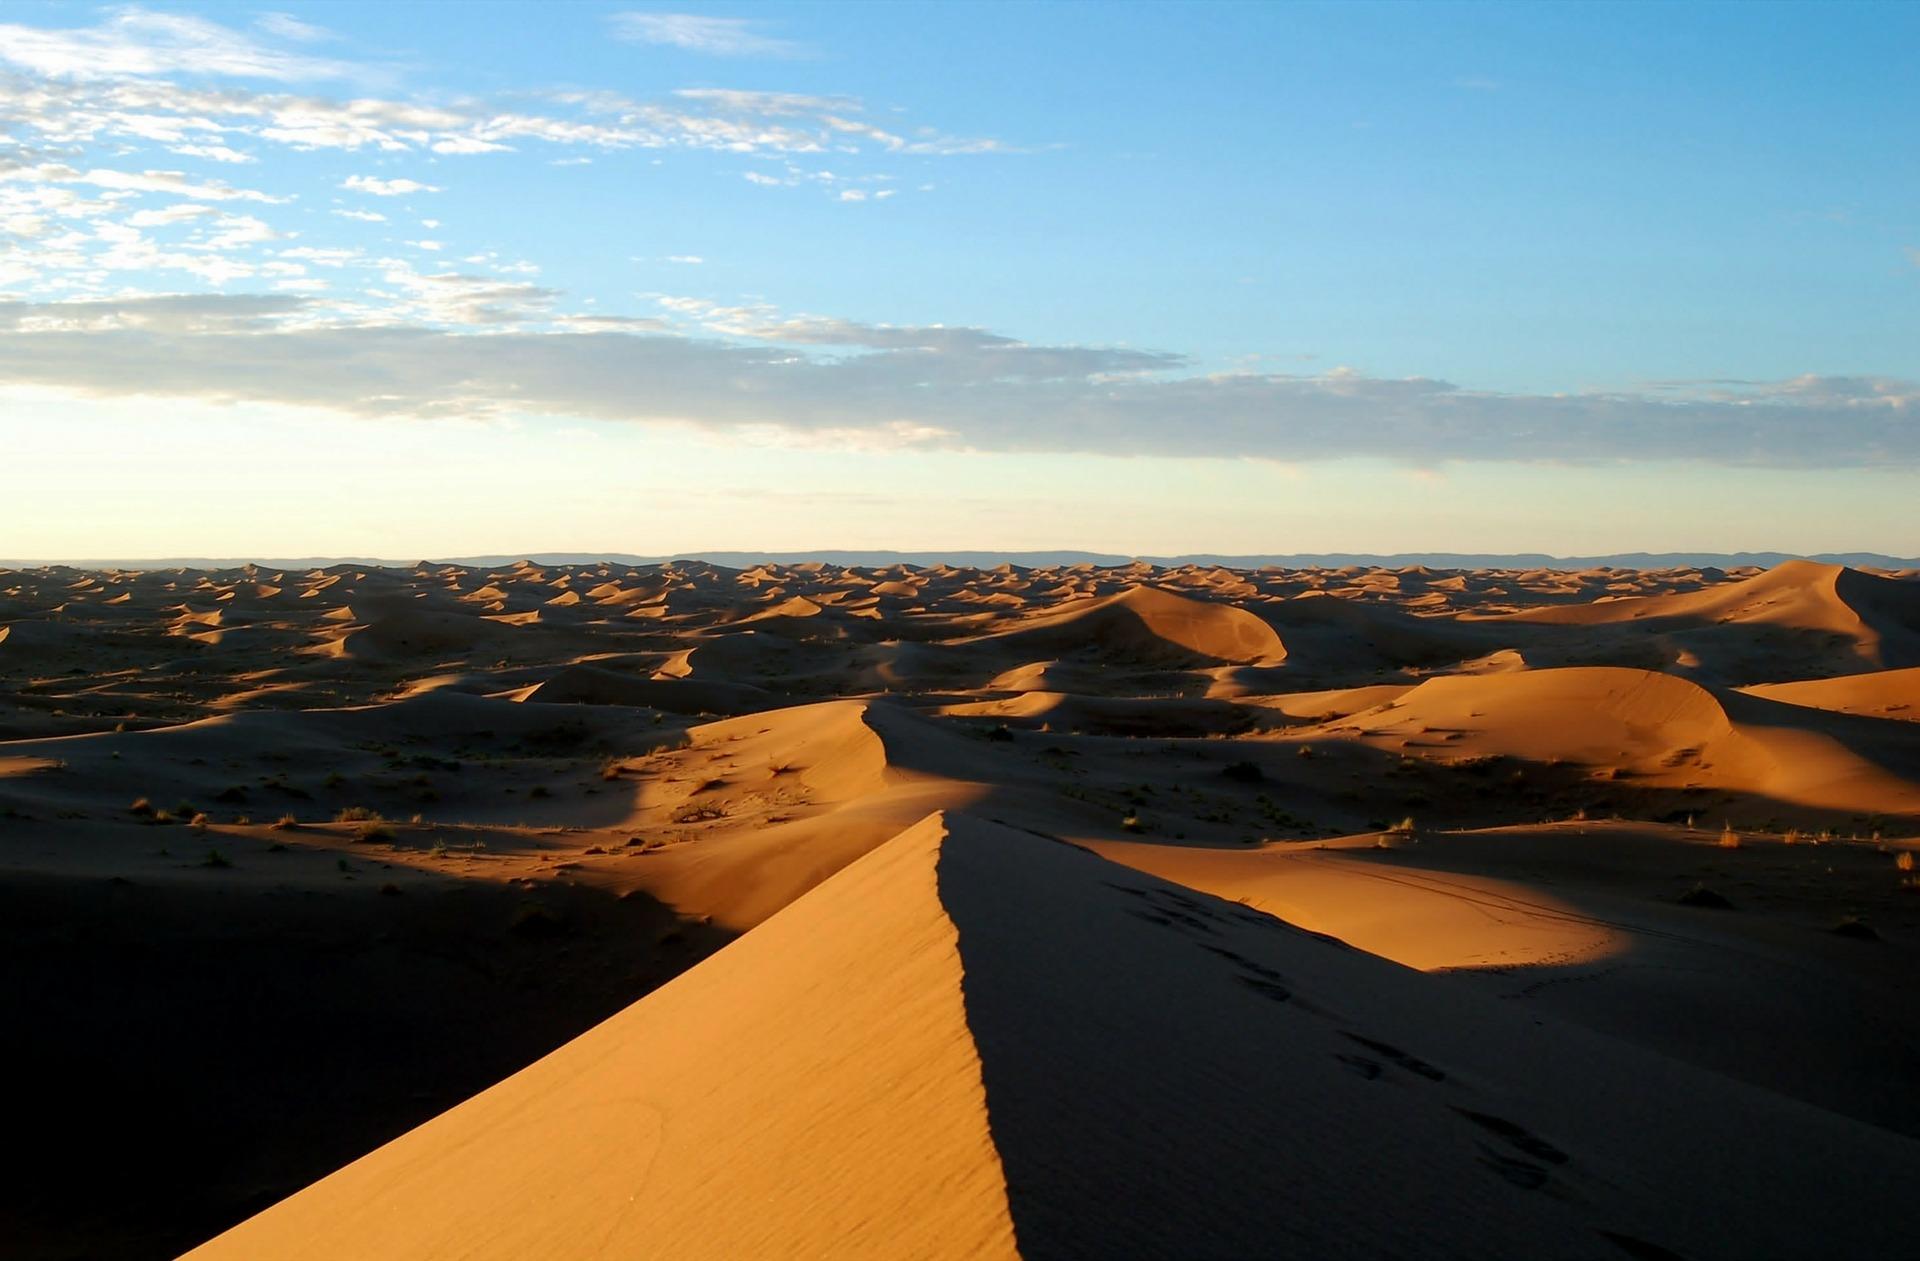 morocco-123977_1920